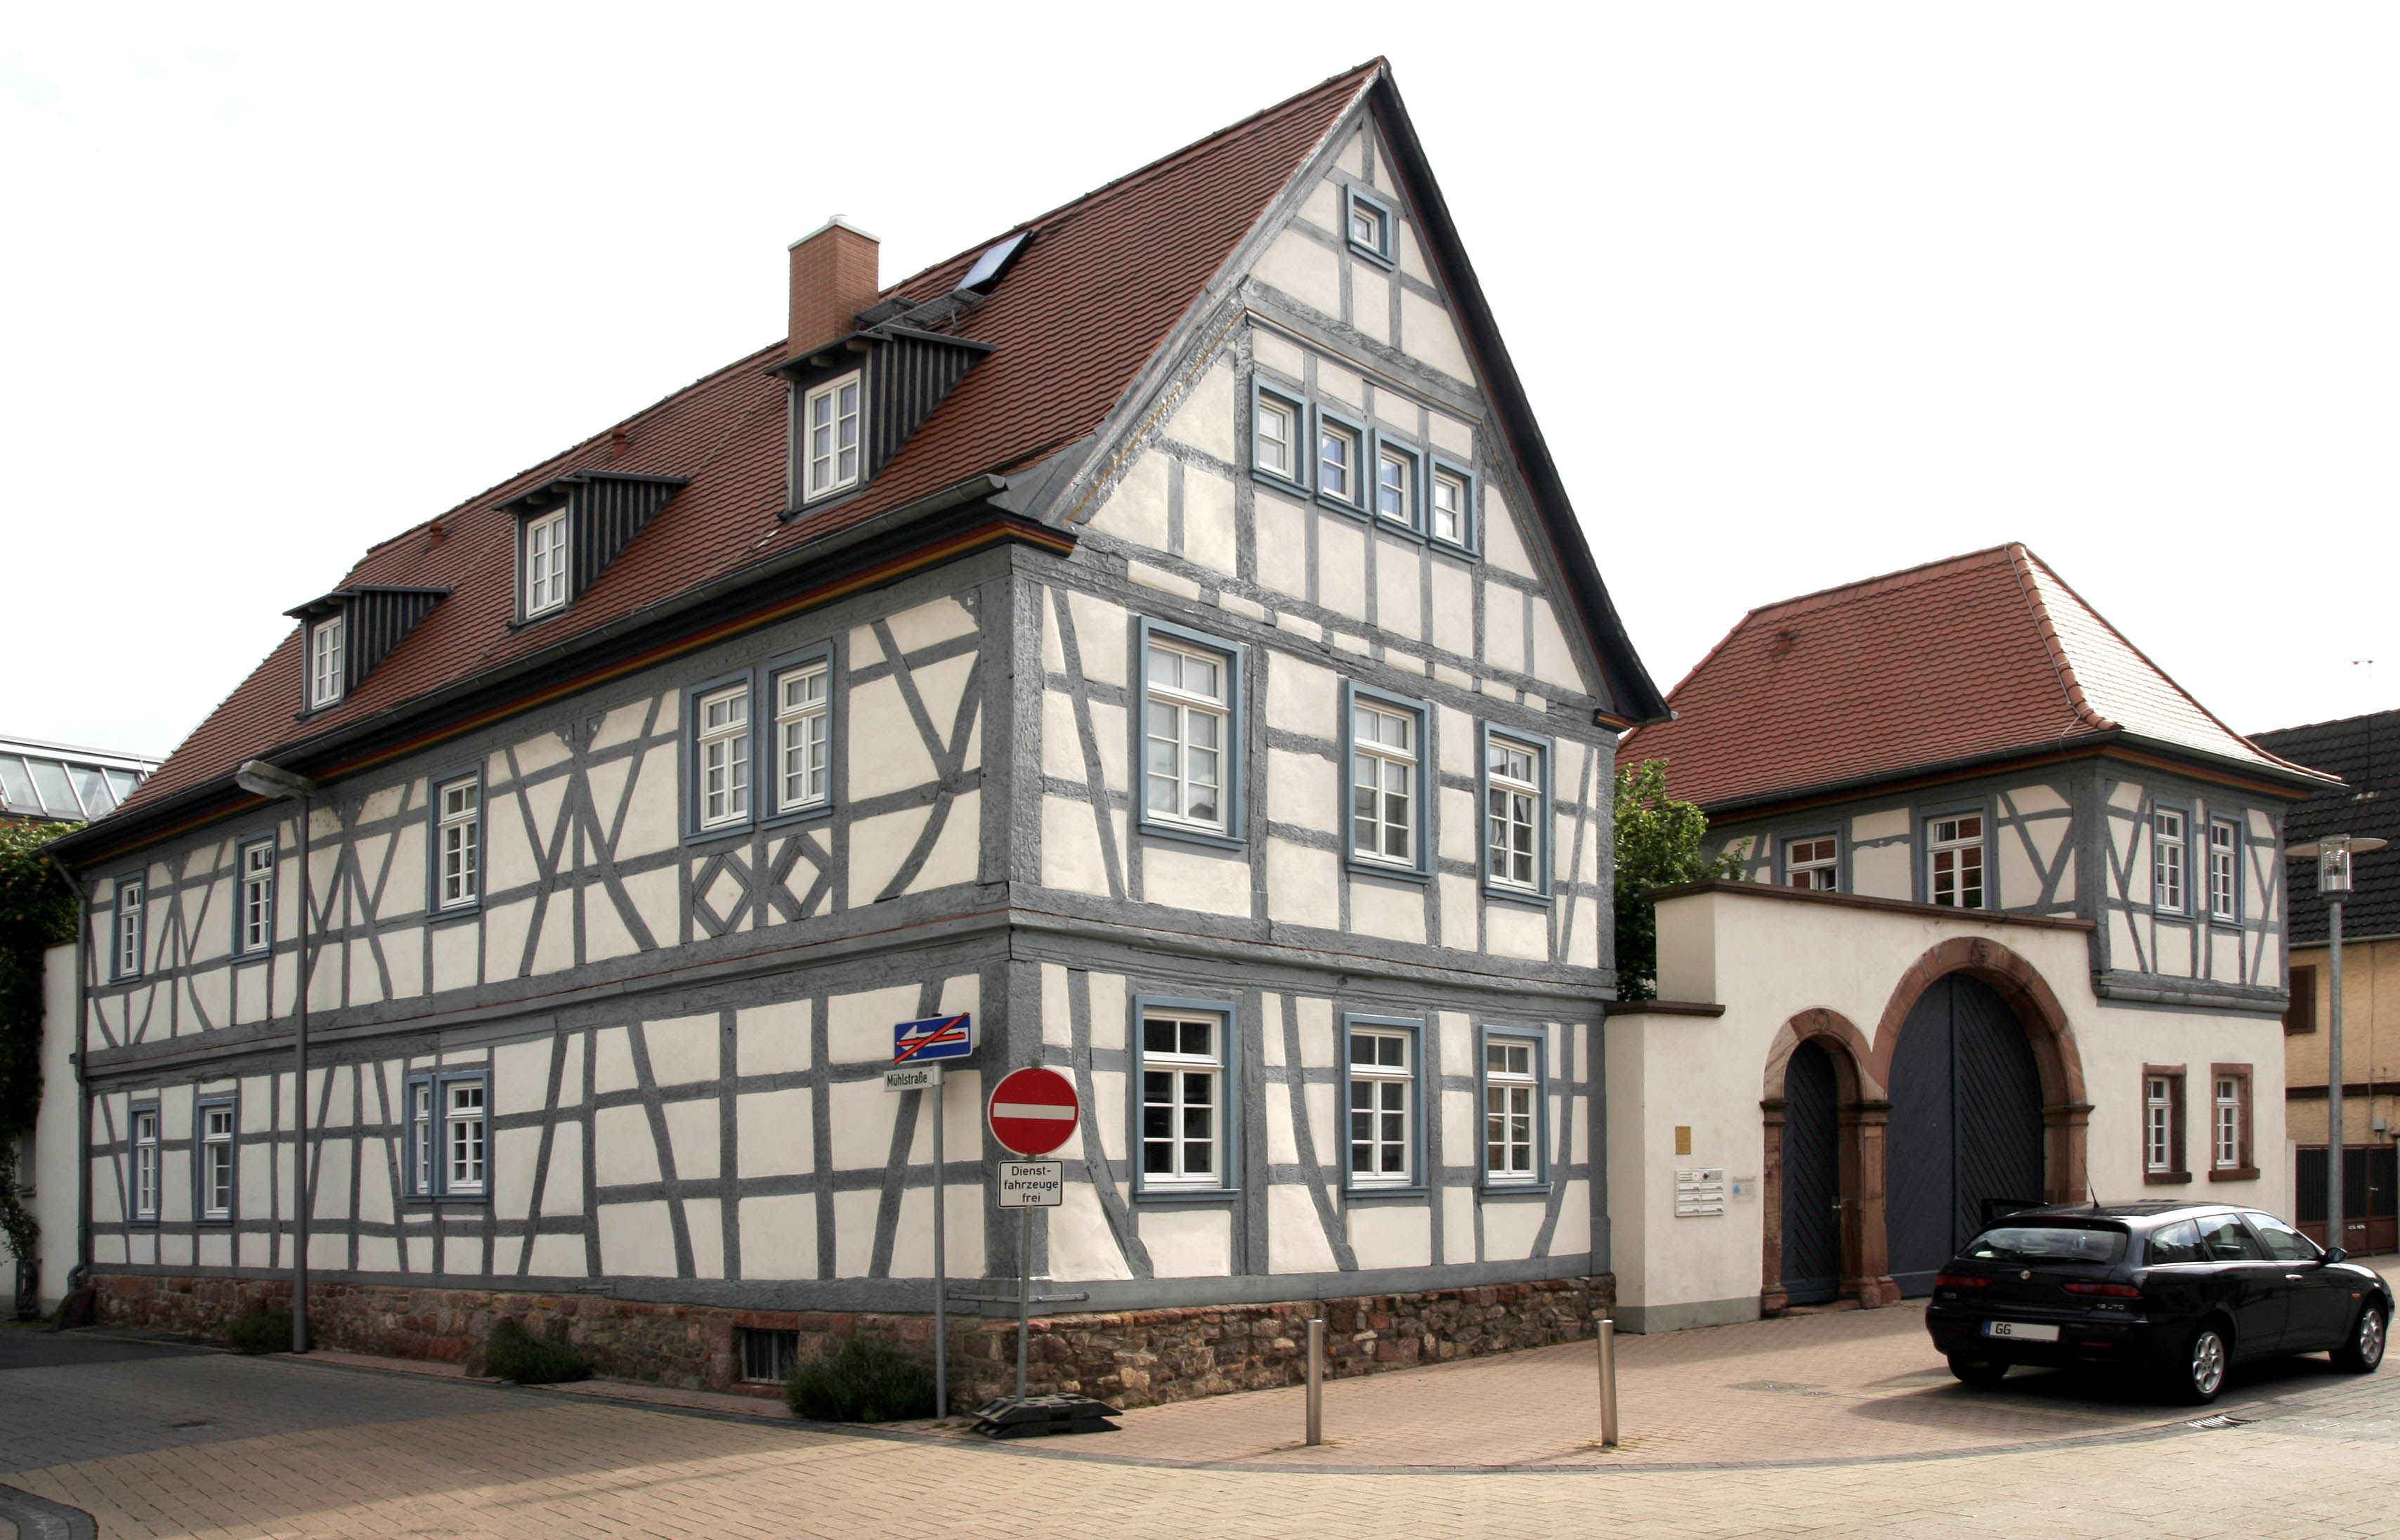 Gross-Gerau Germany  city photos gallery : Gross Gerau Fachwerk 04 Wikimedia Commons